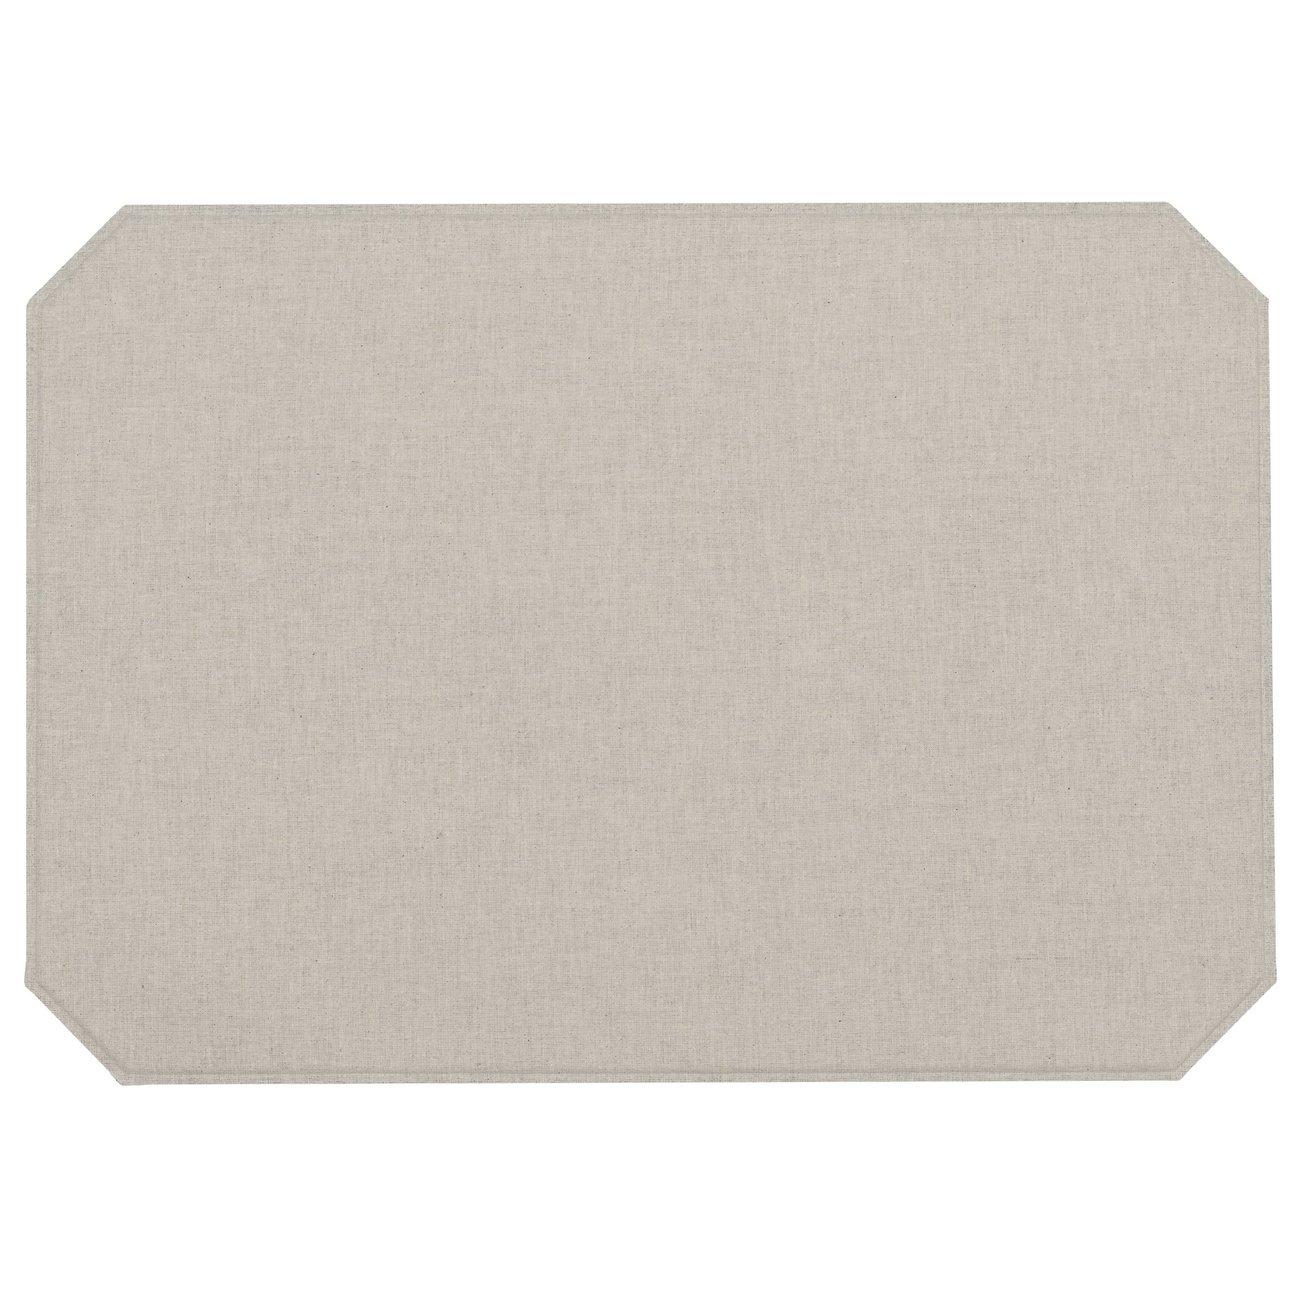 4pets Ersatz Bodenmatte für Hundebox ECO, Bodenmatte für ECO 1 S H0,2xB62,5xT44cm